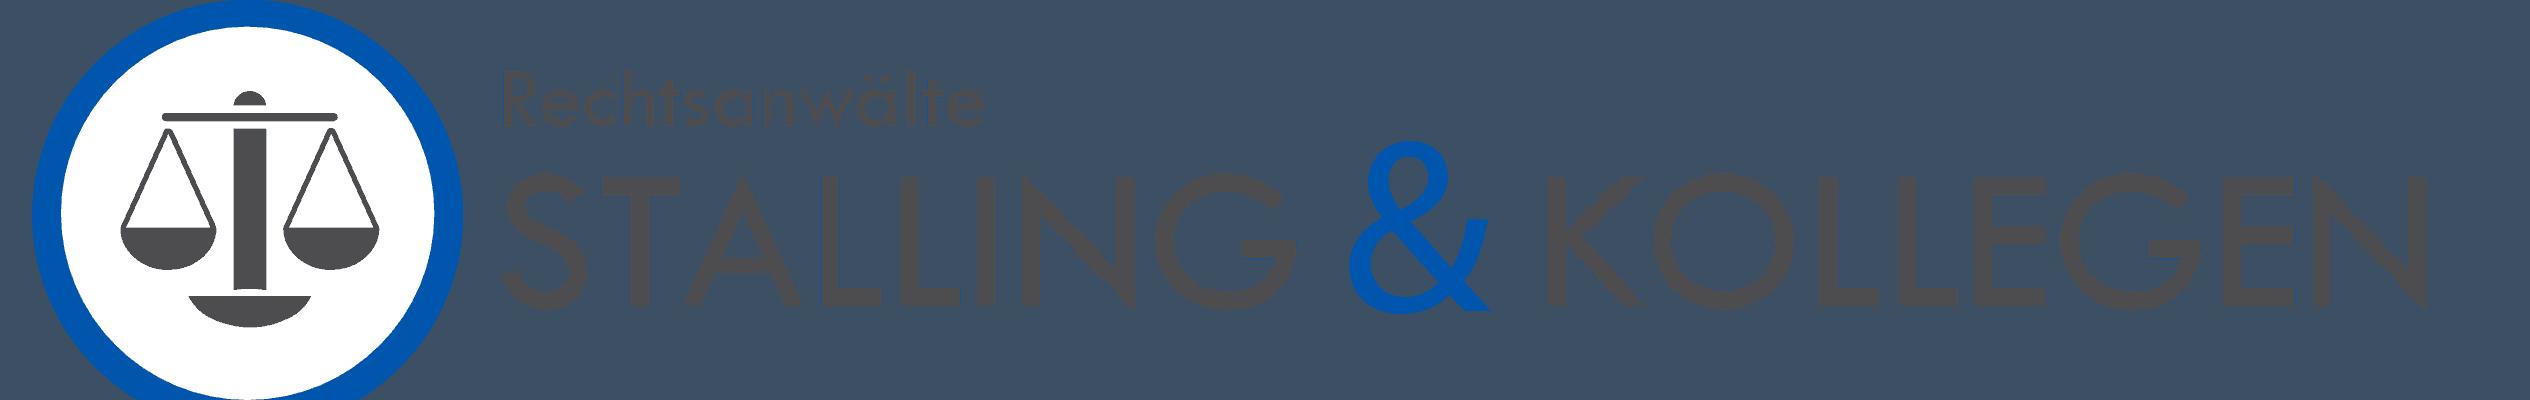 Rechtsanwälte Stalling und Kollegen – rechtliche Hilfe bei Arbeitsrecht, Erbrecht, Familienrecht, Handelsrecht, Markenrecht, Strafrecht, Verkehrsrecht und Vertragsrecht in Kassel und Umgebung